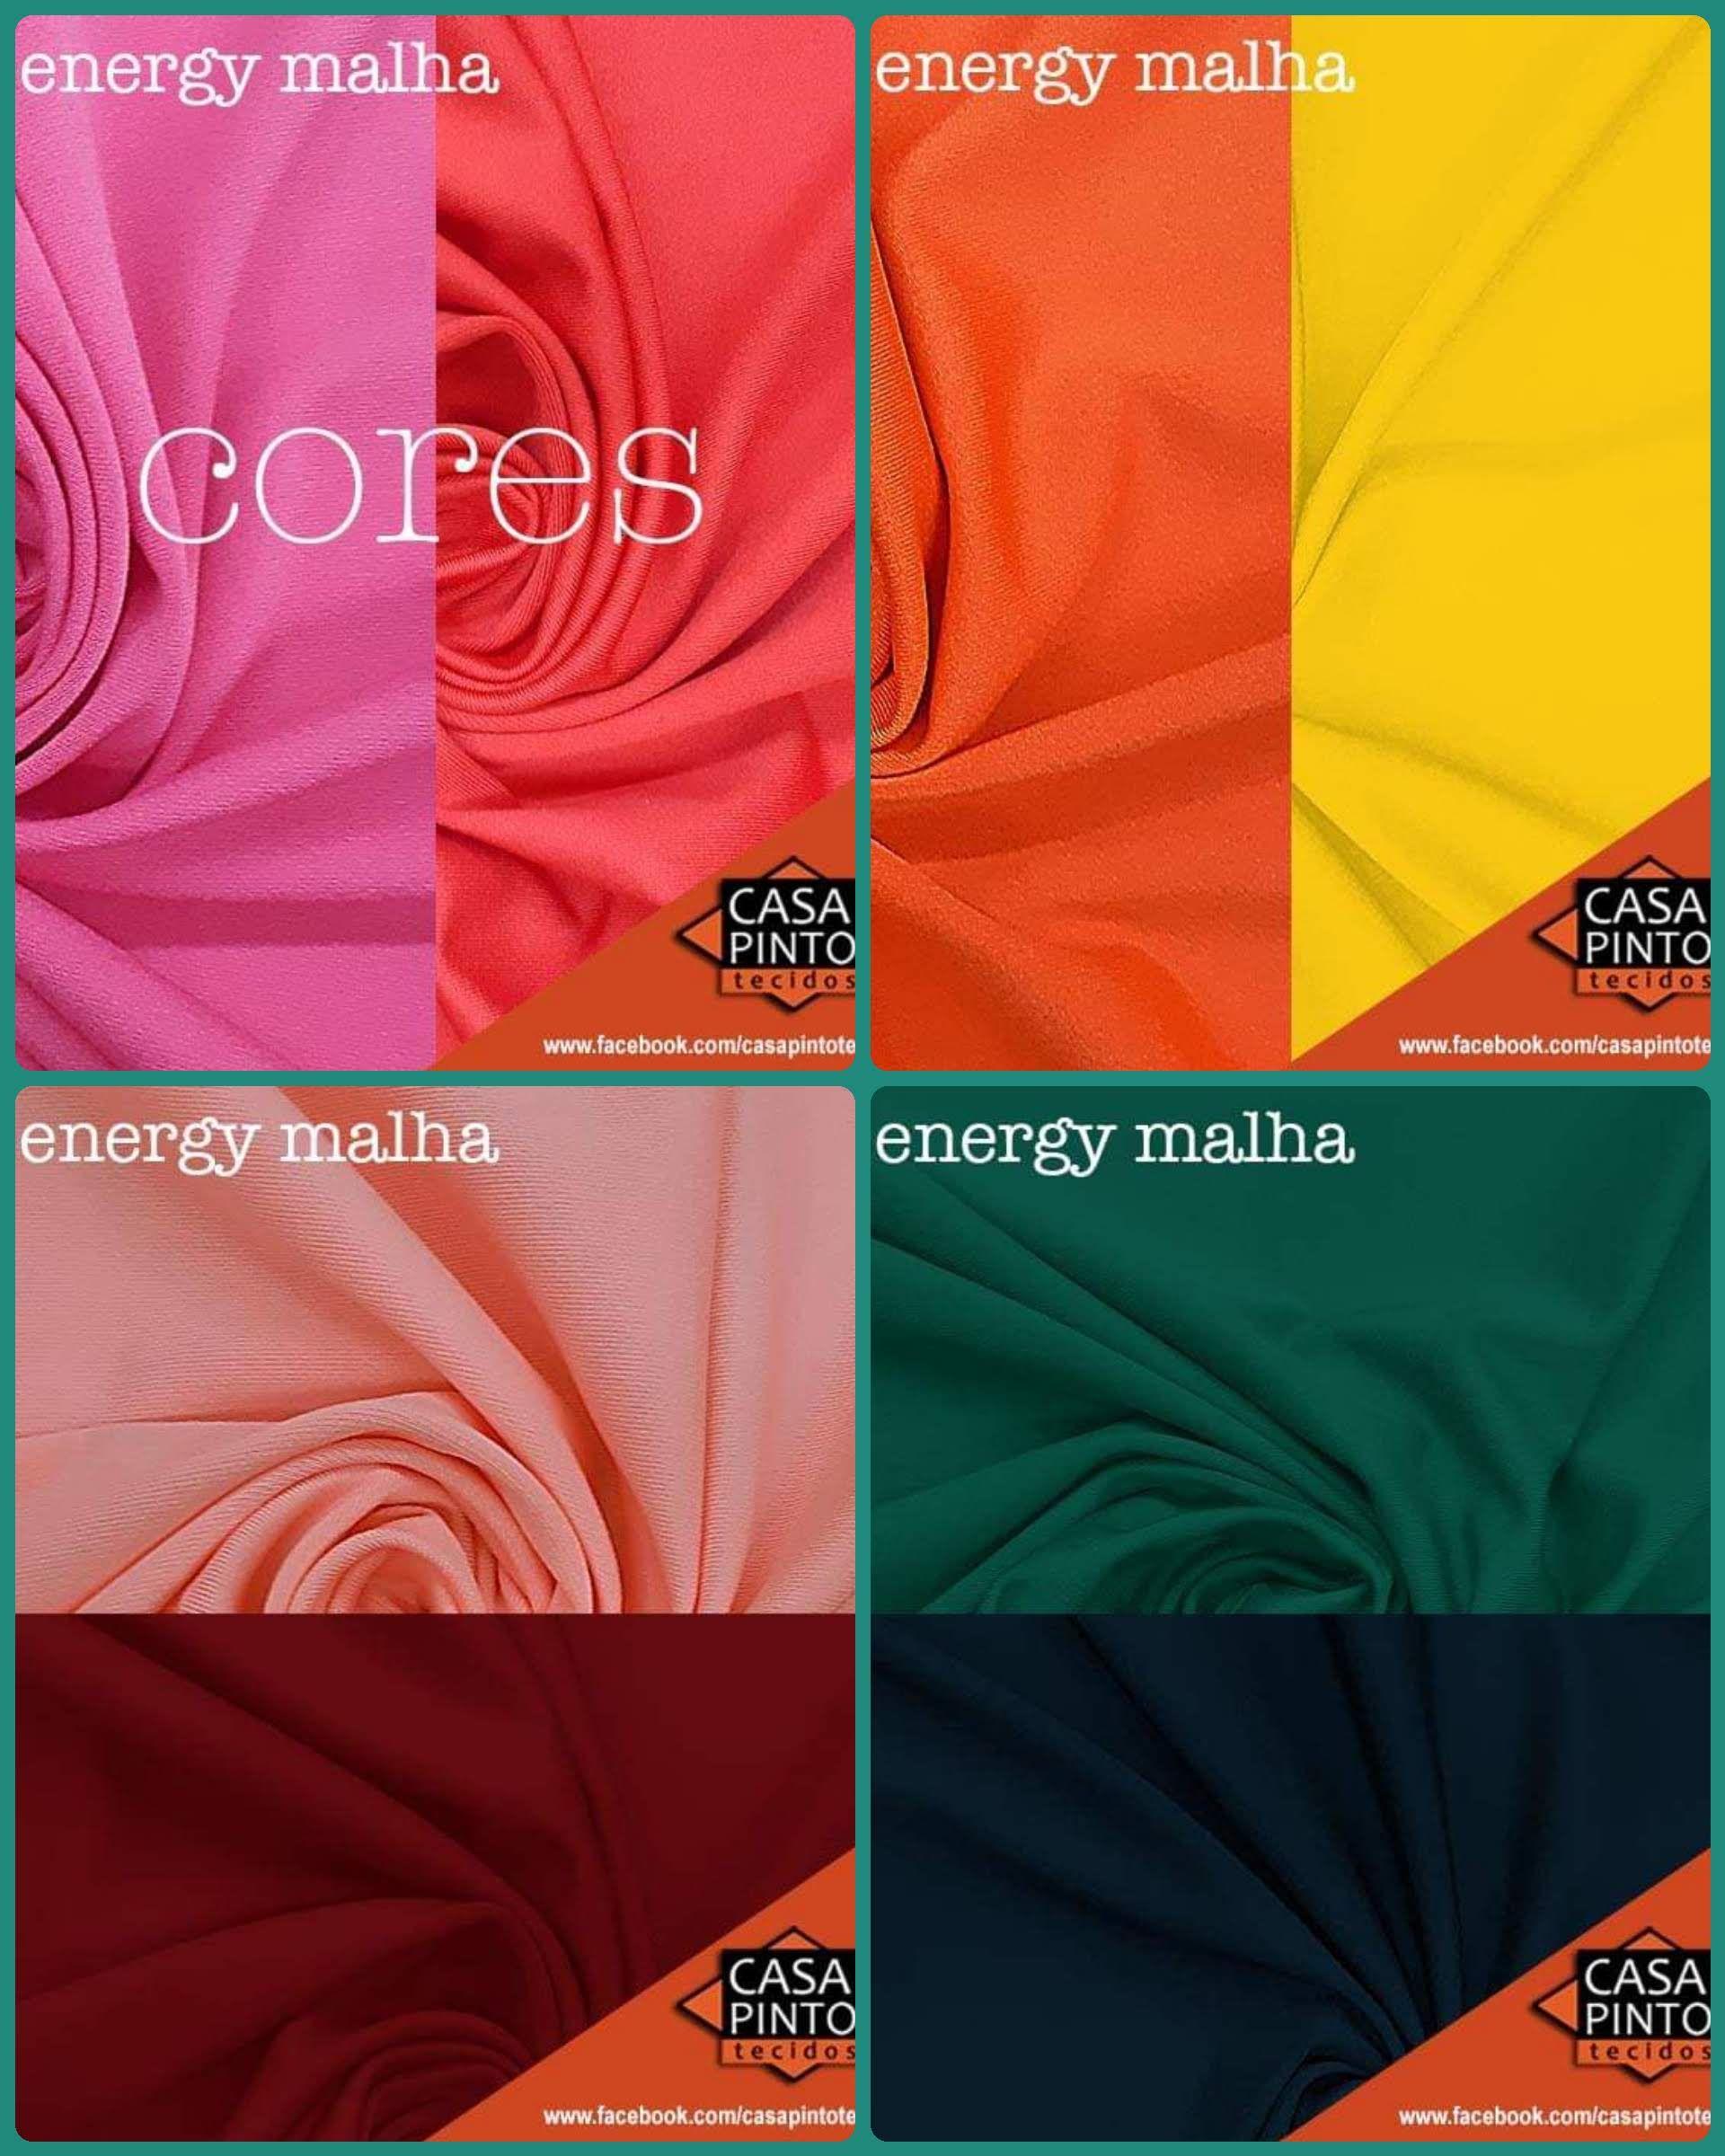 557f3e368c Malha Energy - Comp.: 91% Poliéster/9% Elastano - Larg.: 1,60 m ...